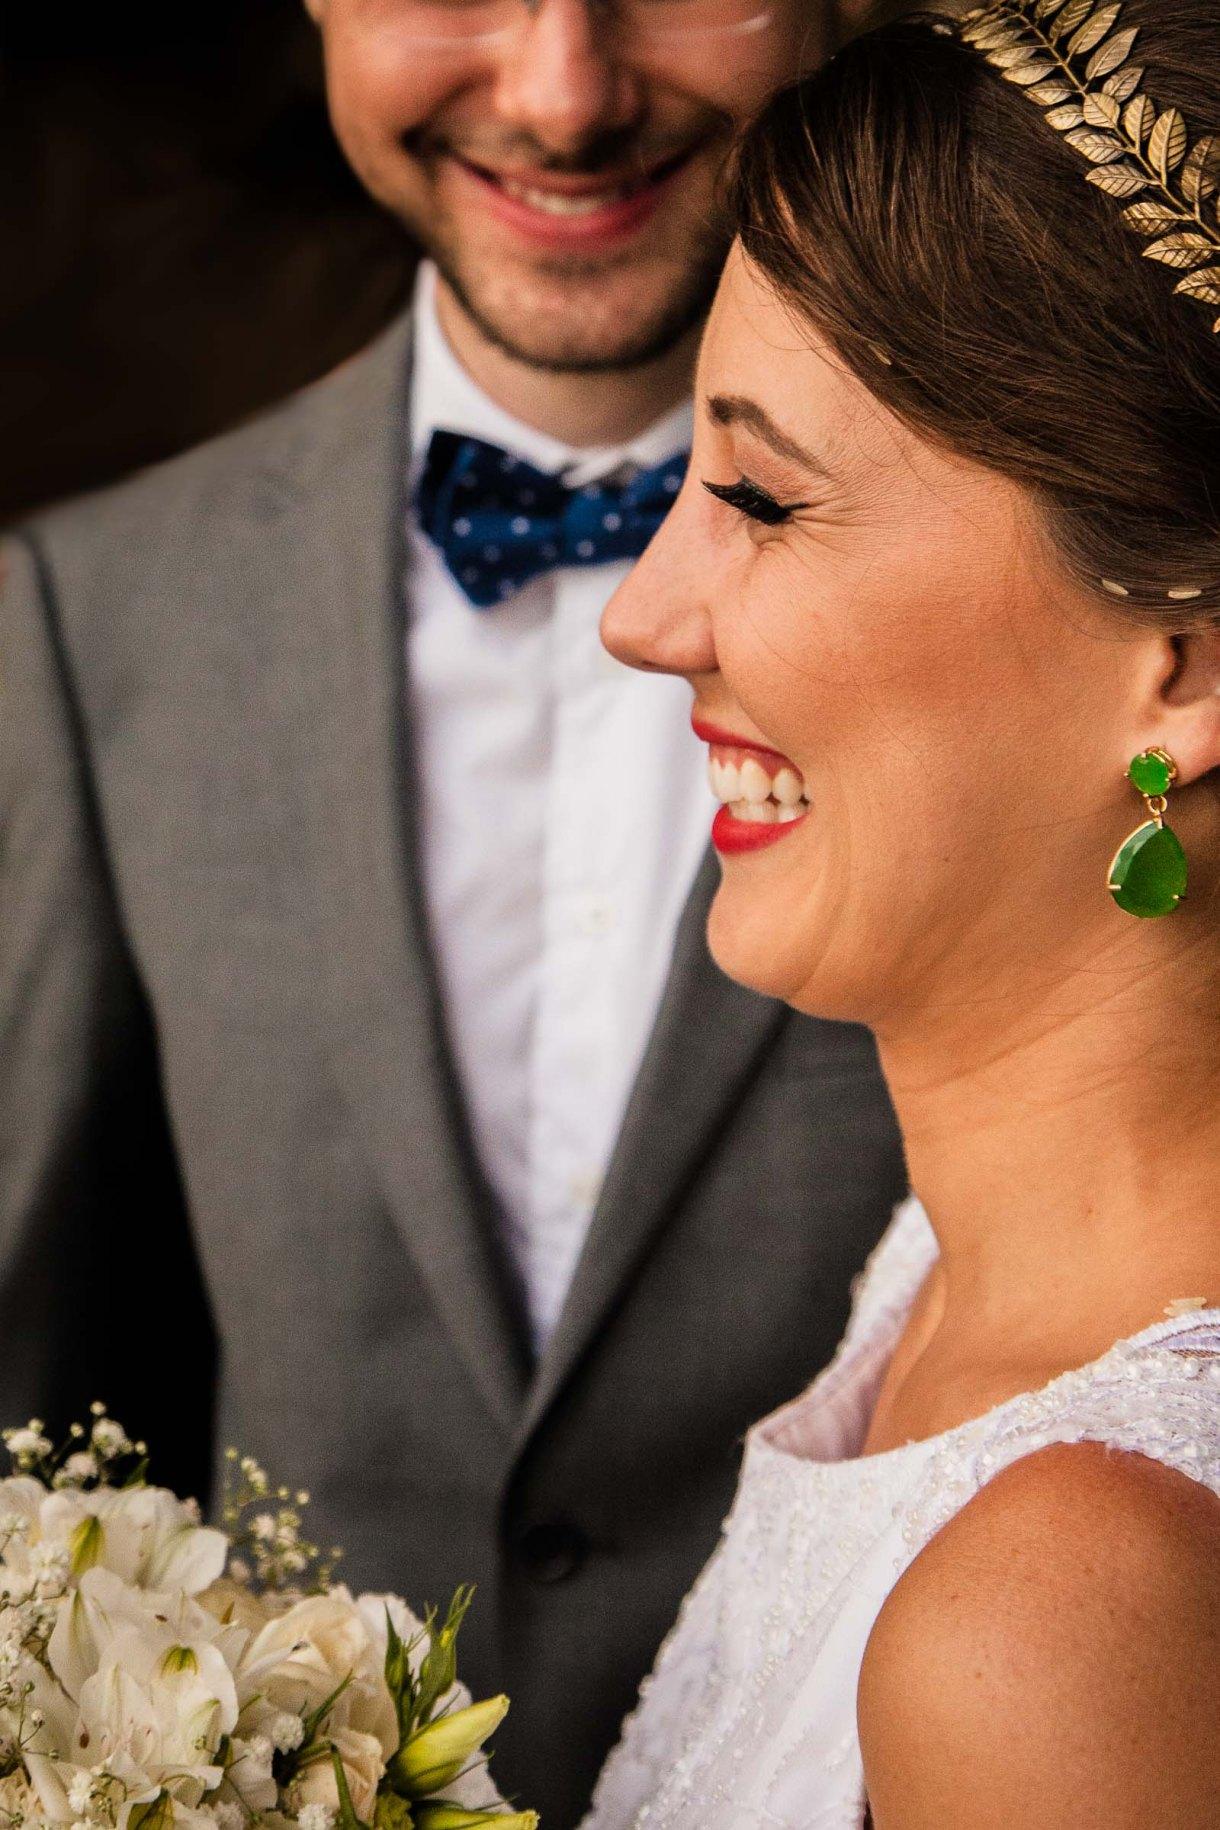 Fotografia de casamento Imbuia - Fotógrafo Imbuia- Fotógrafo profissional Imbuia - Santa Catarina